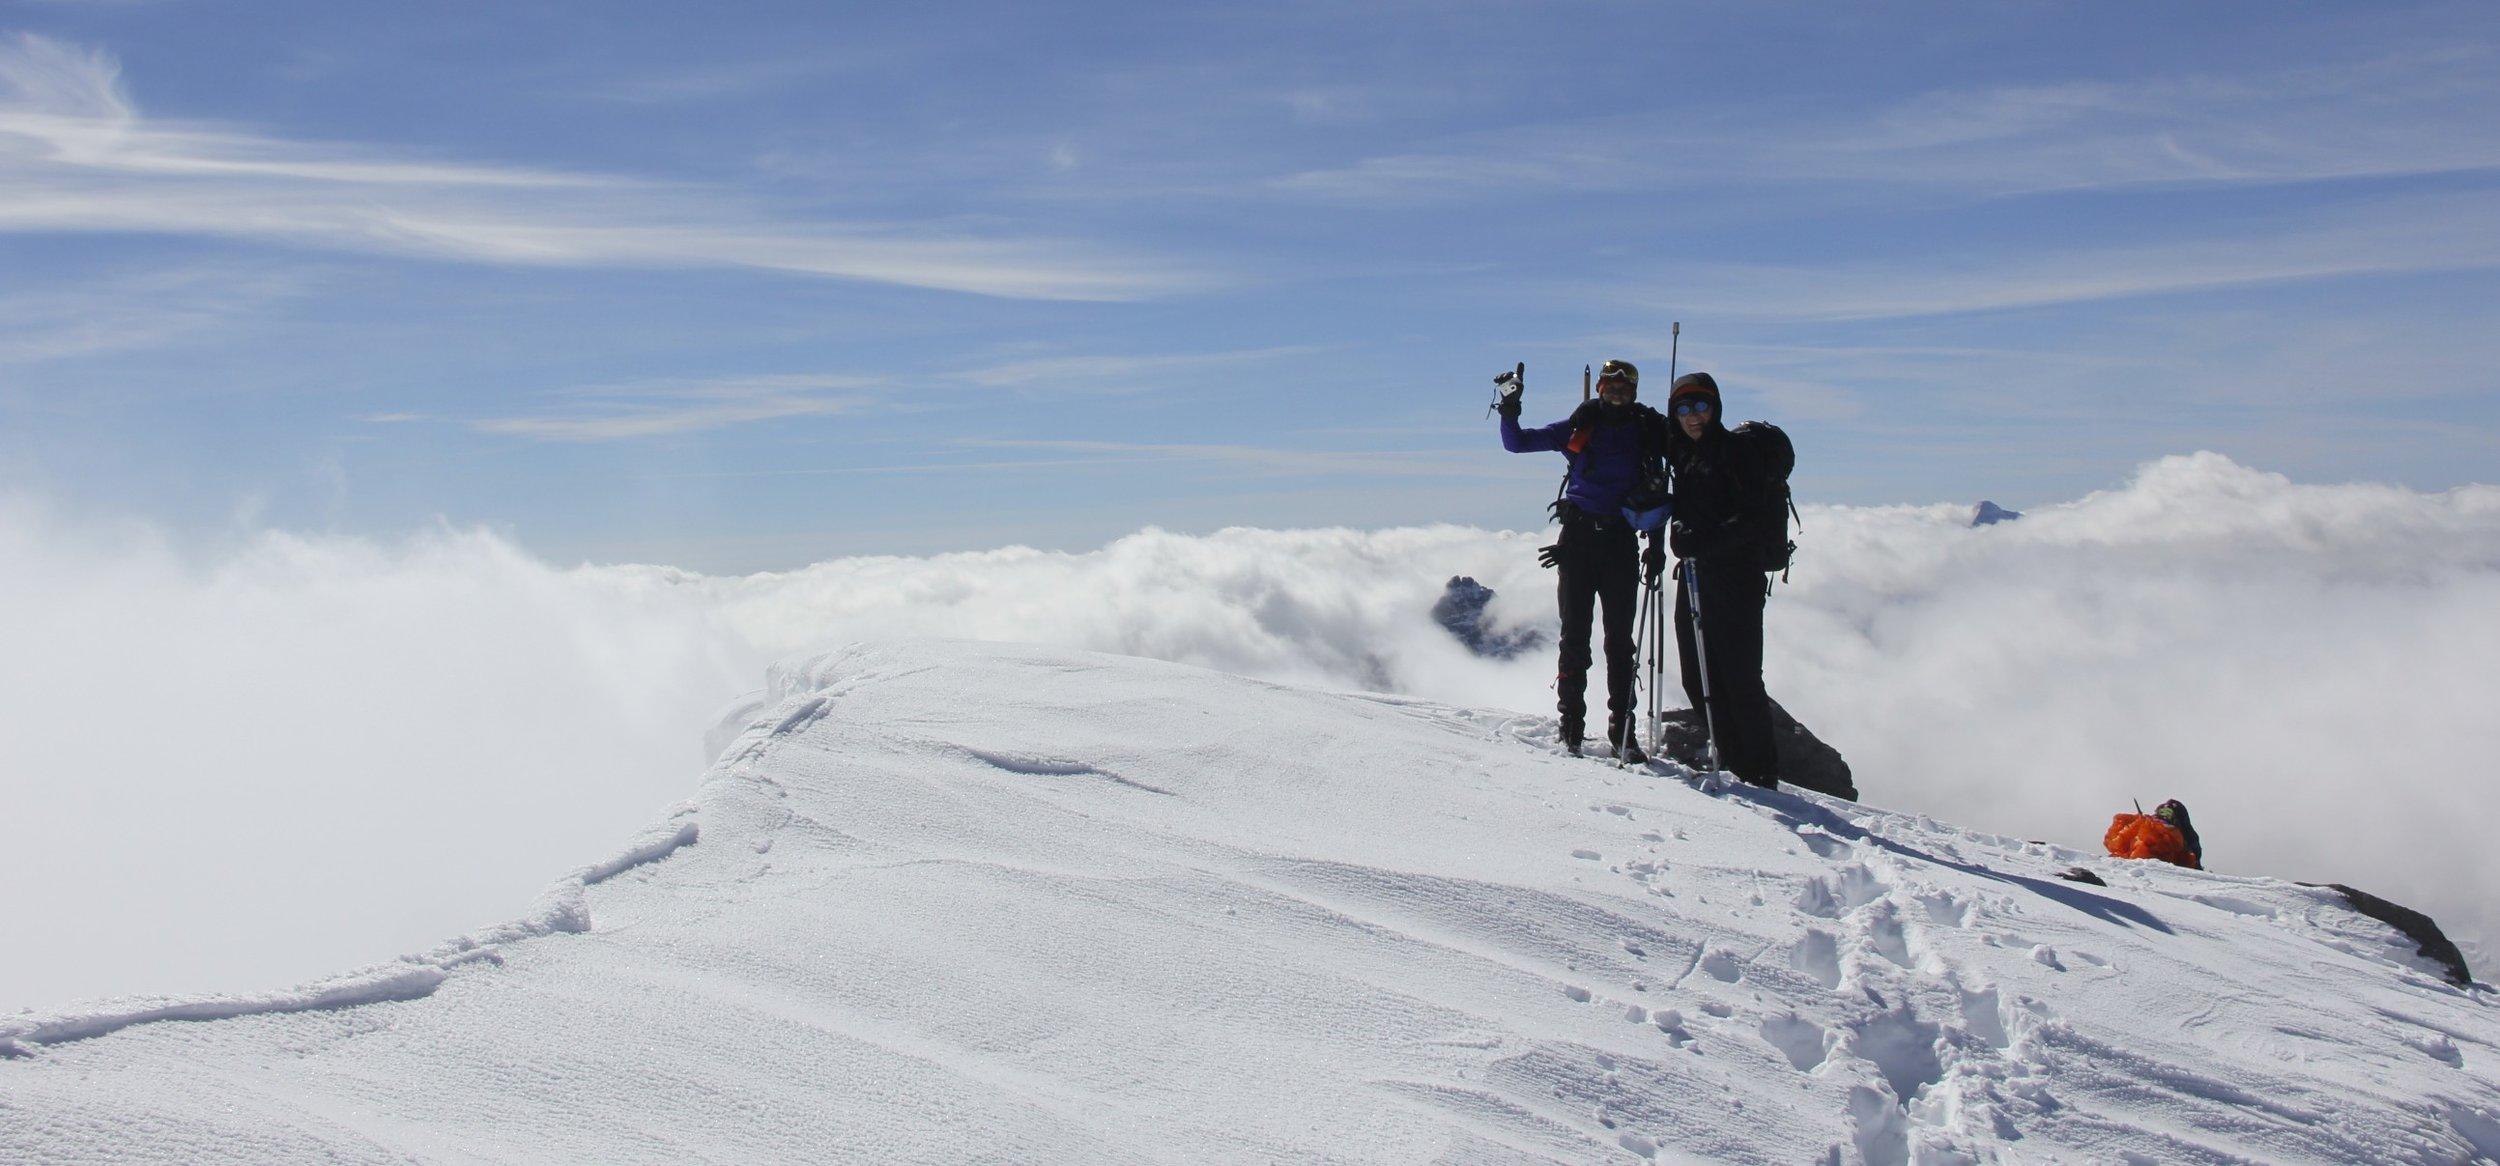 Summit of Mt. Temple 3,544m